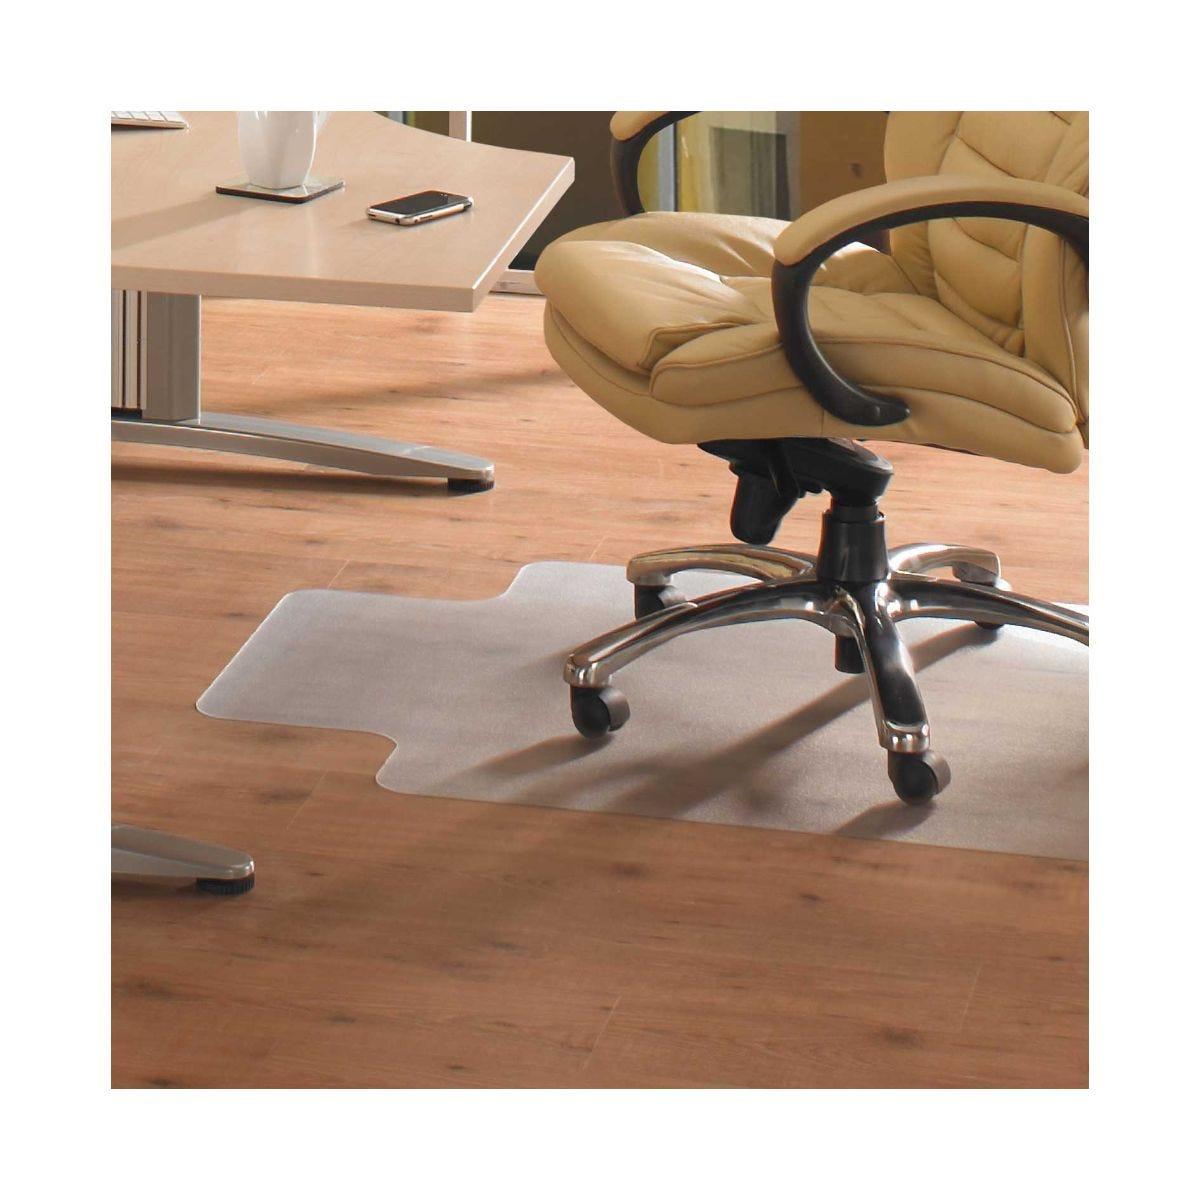 Floor & Desk Mats fice Accessories Furniture & Storage Ryman